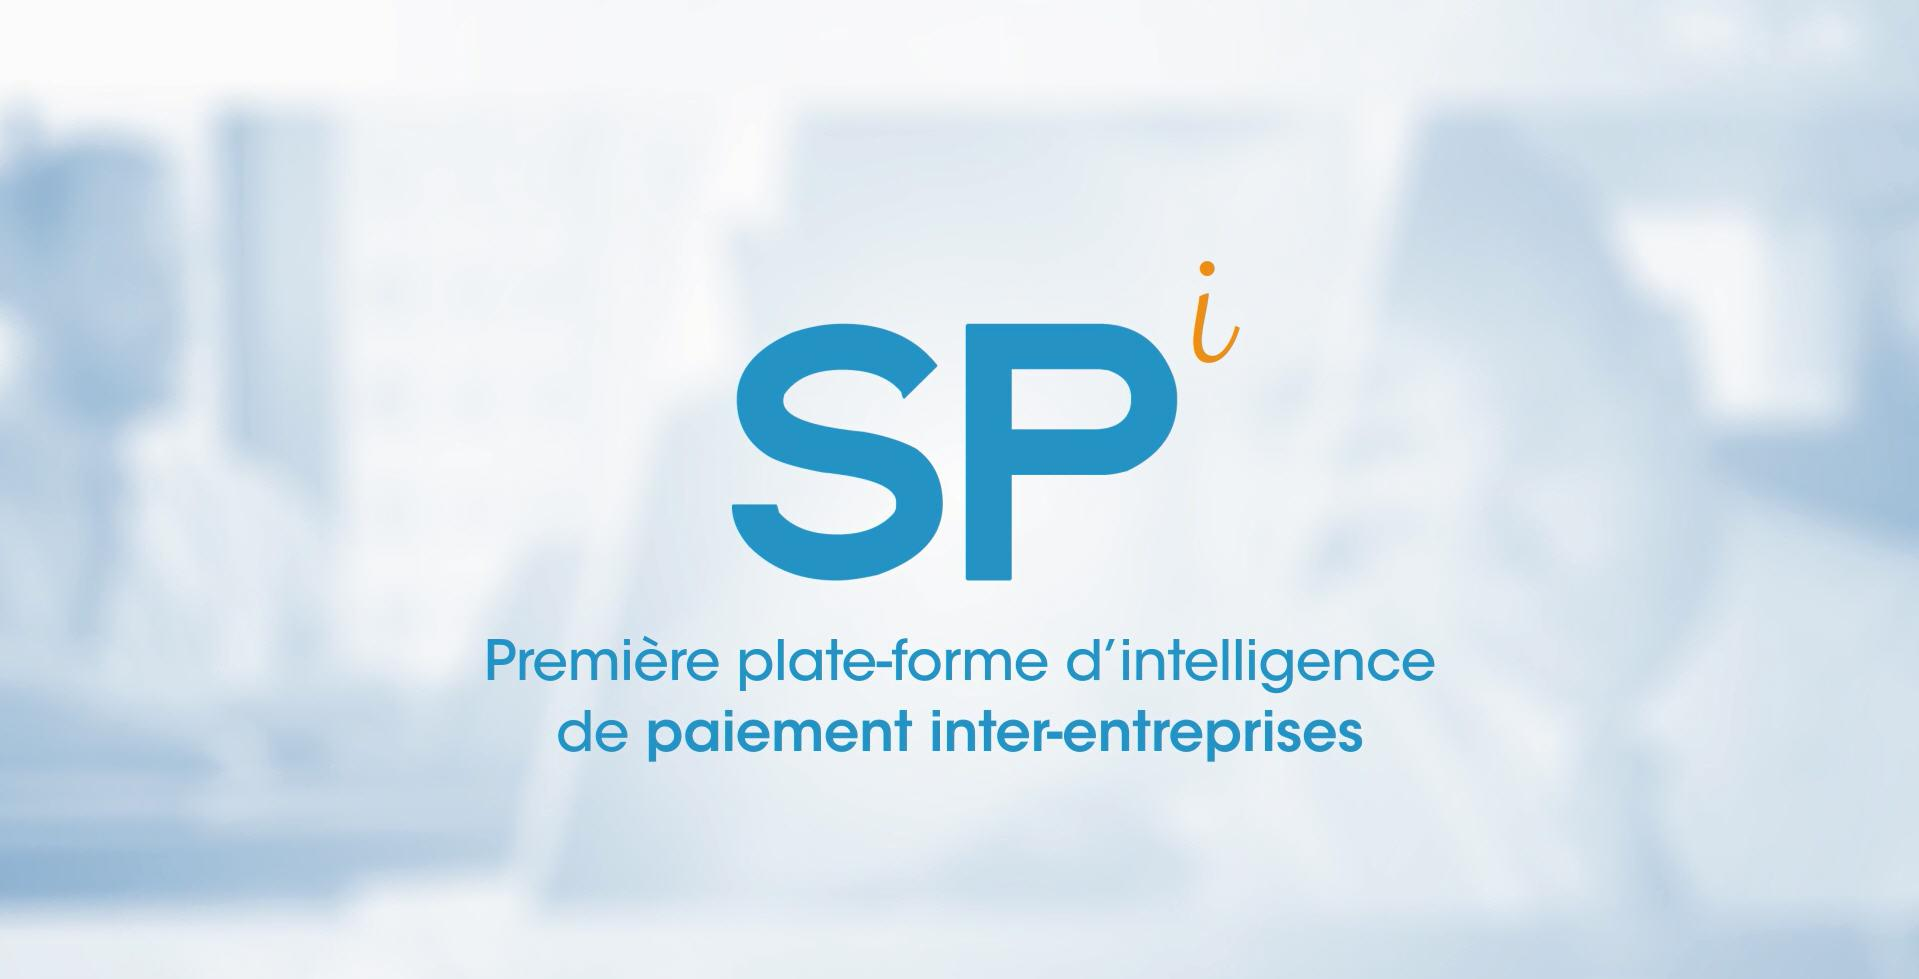 Sidetrade Sales & Marketing-Sidetrade Payment Intelligence - screen shot  1